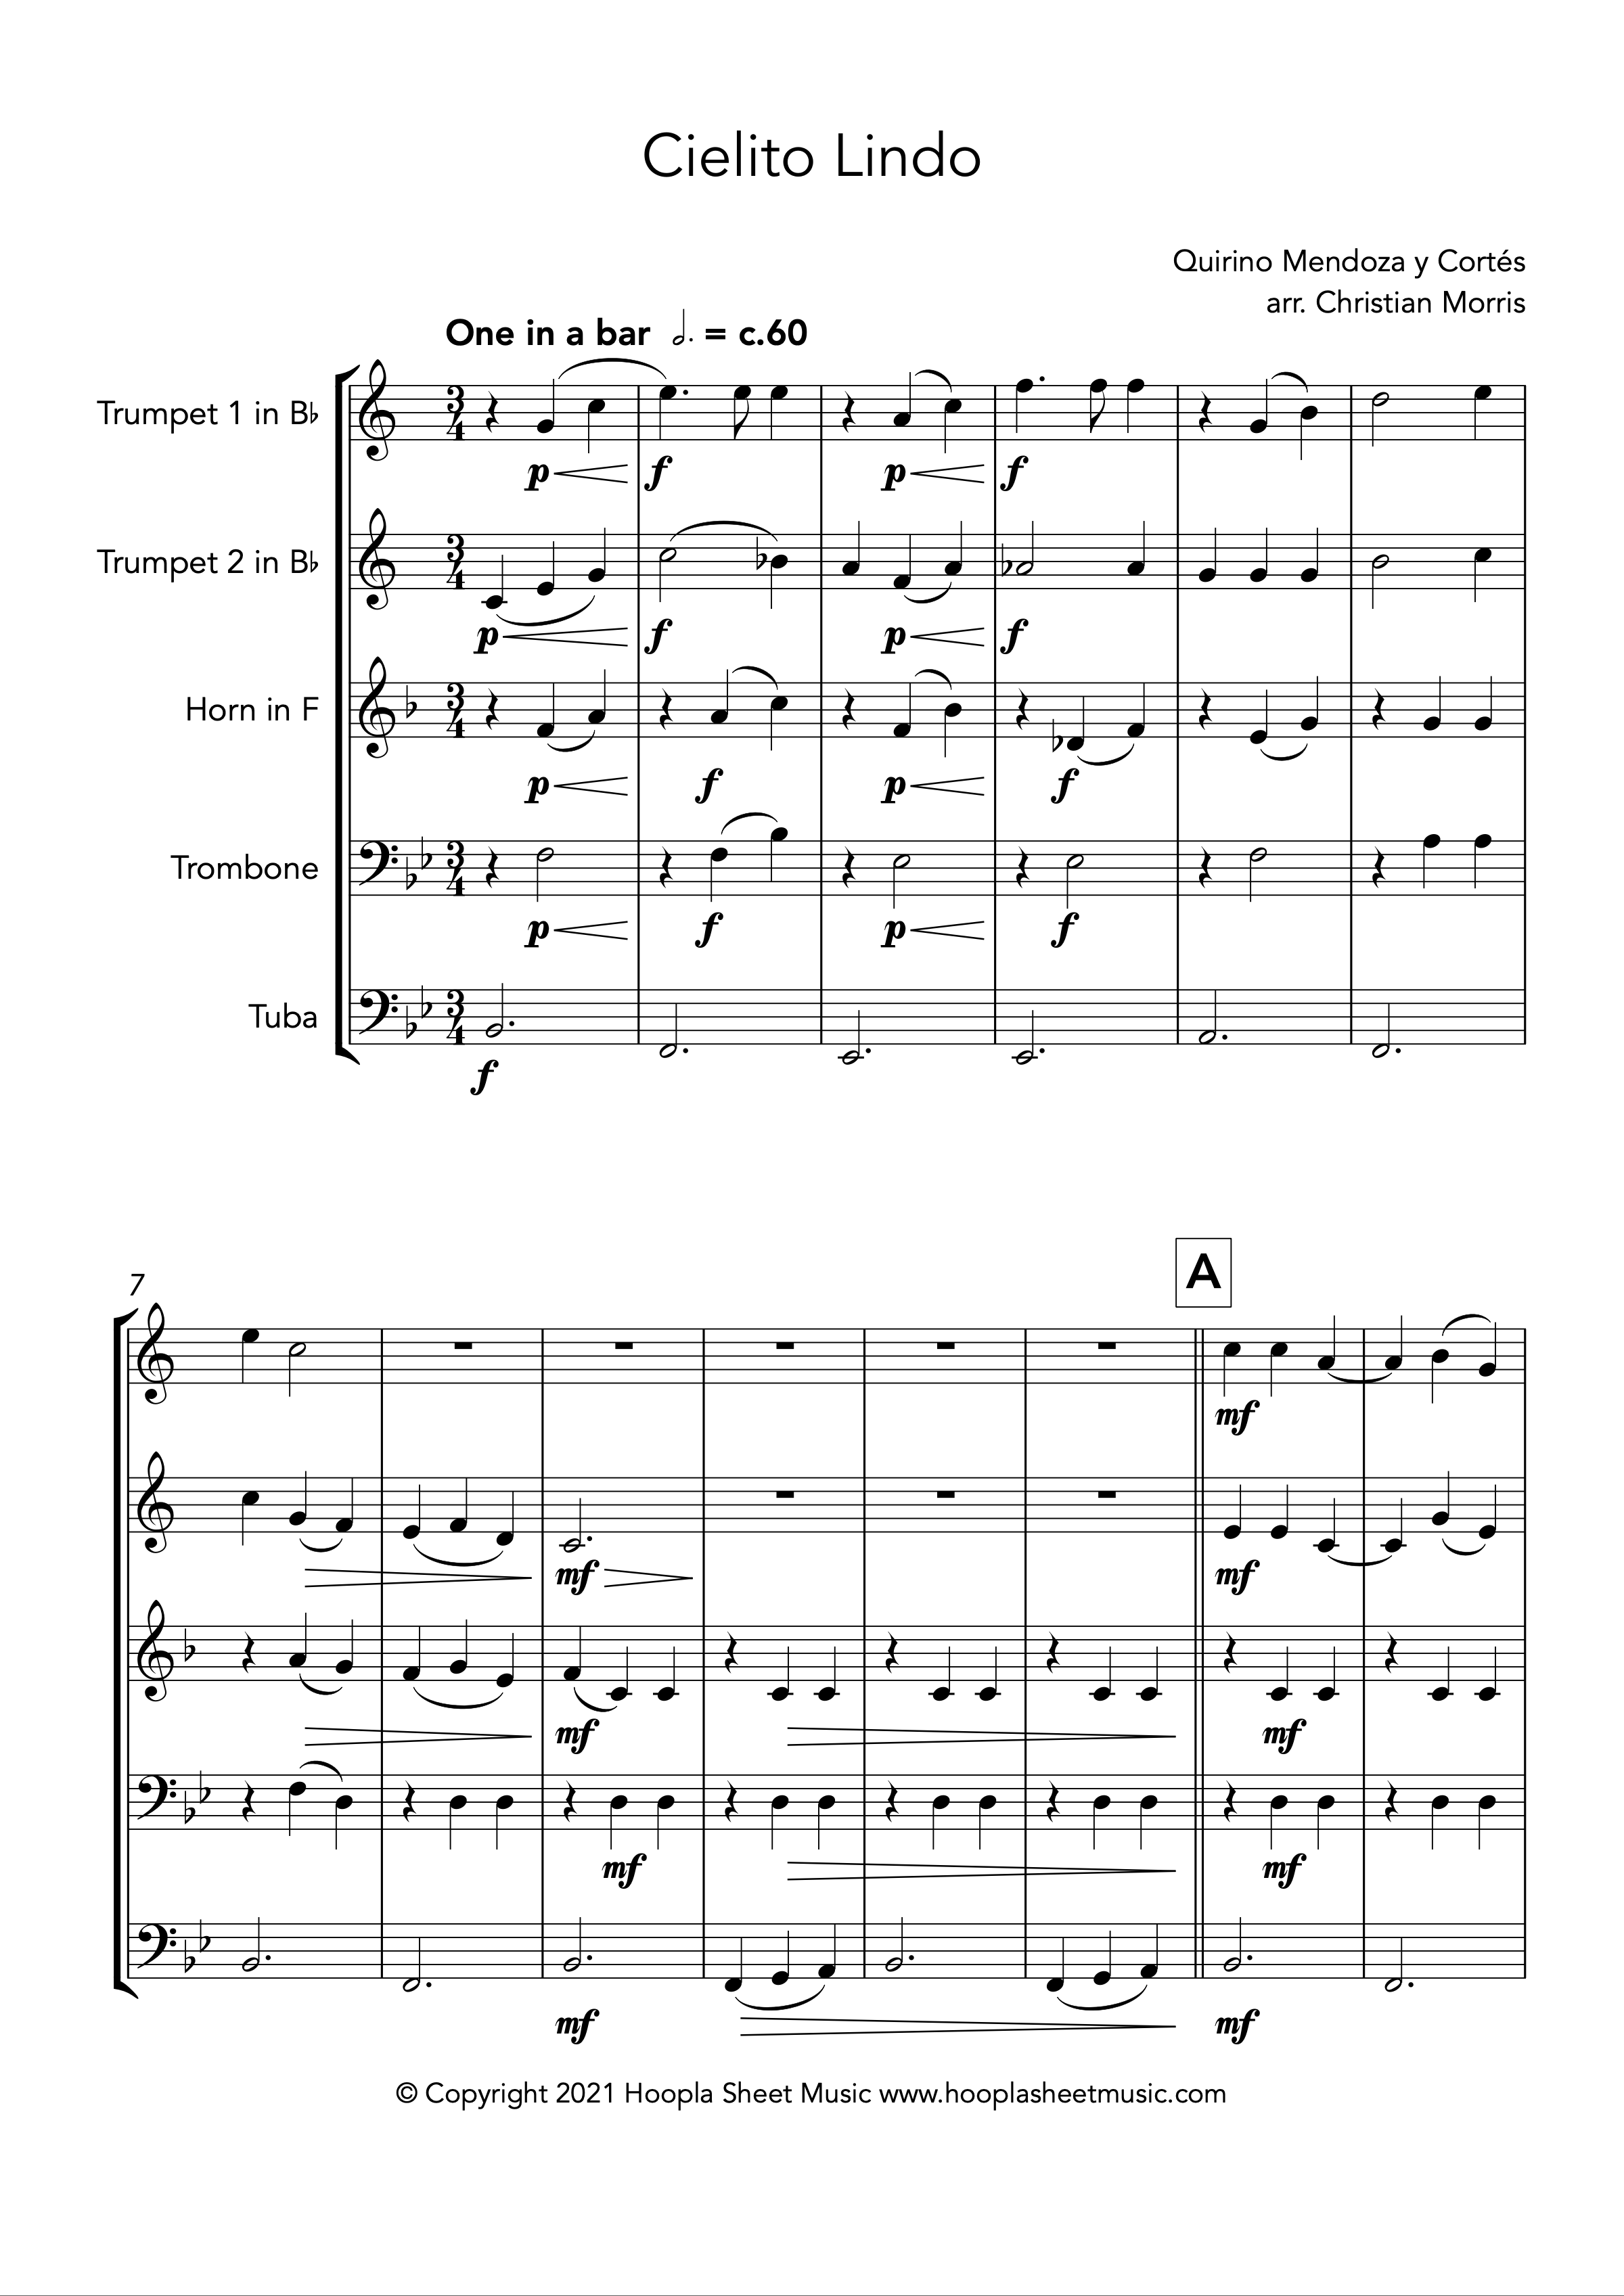 Cielito Lindo (Brass Quintet)